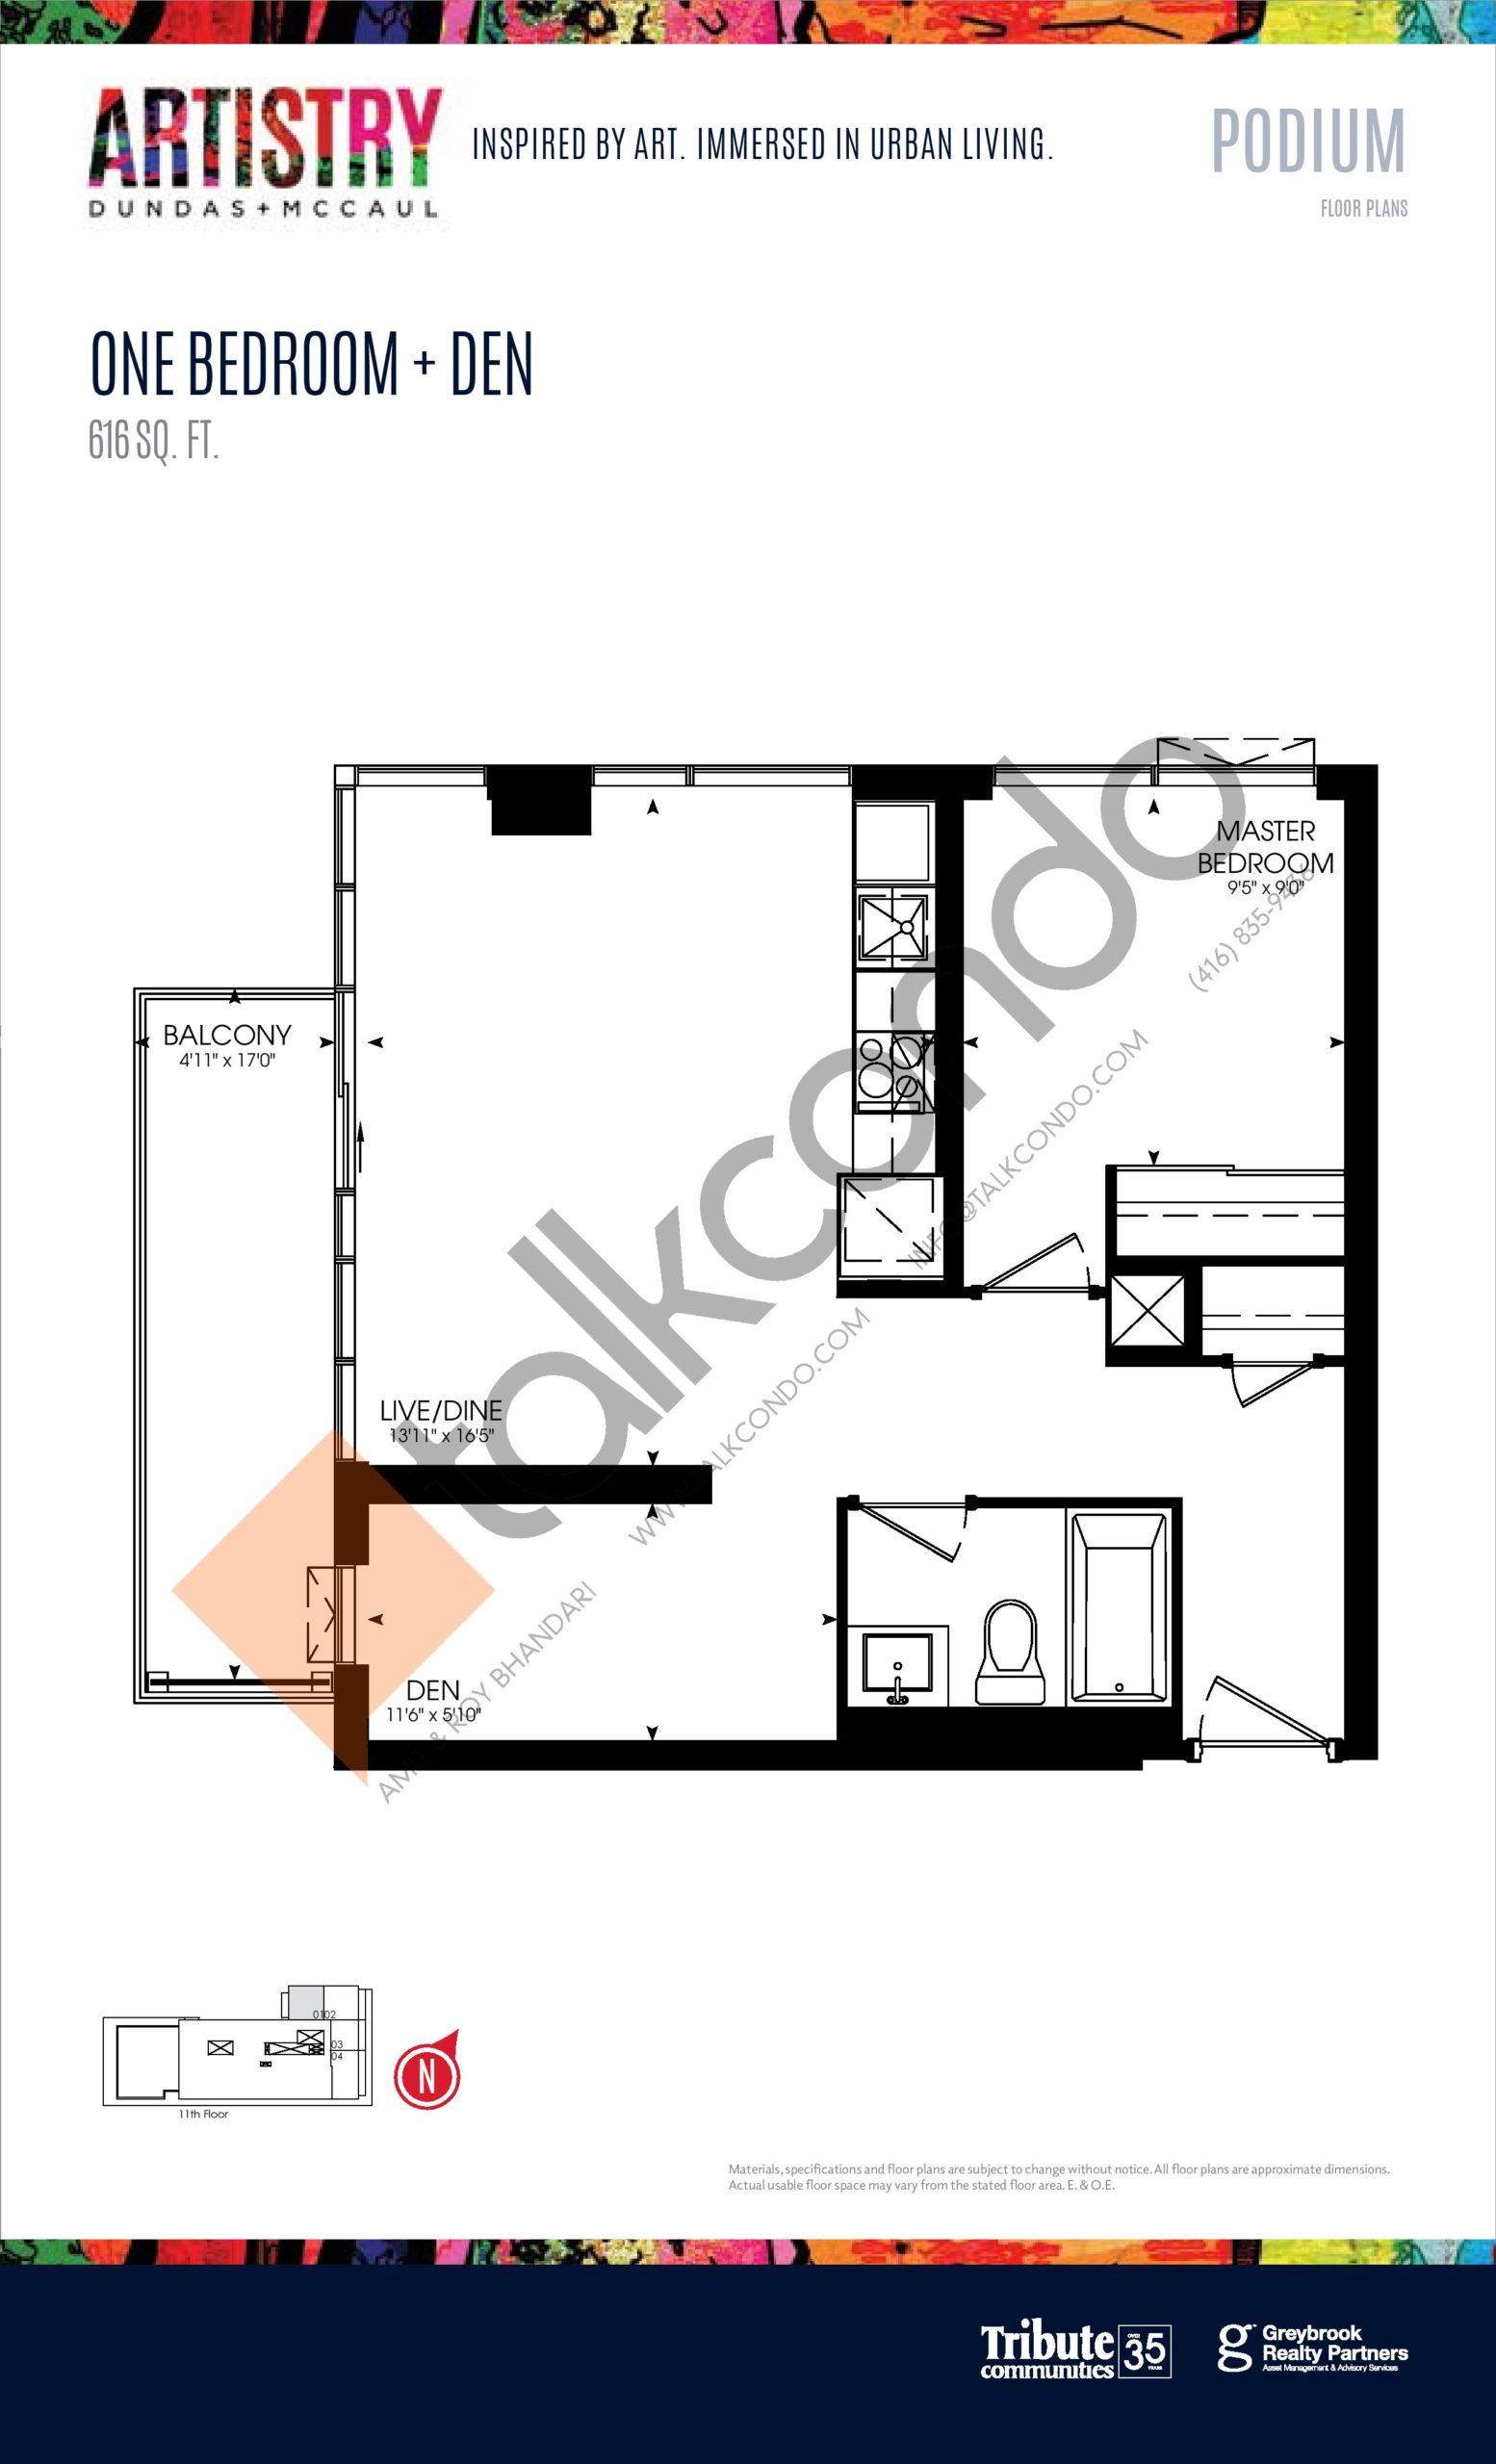 616 sq. ft. - Podium Floor Plan at Artistry Condos - 616 sq.ft